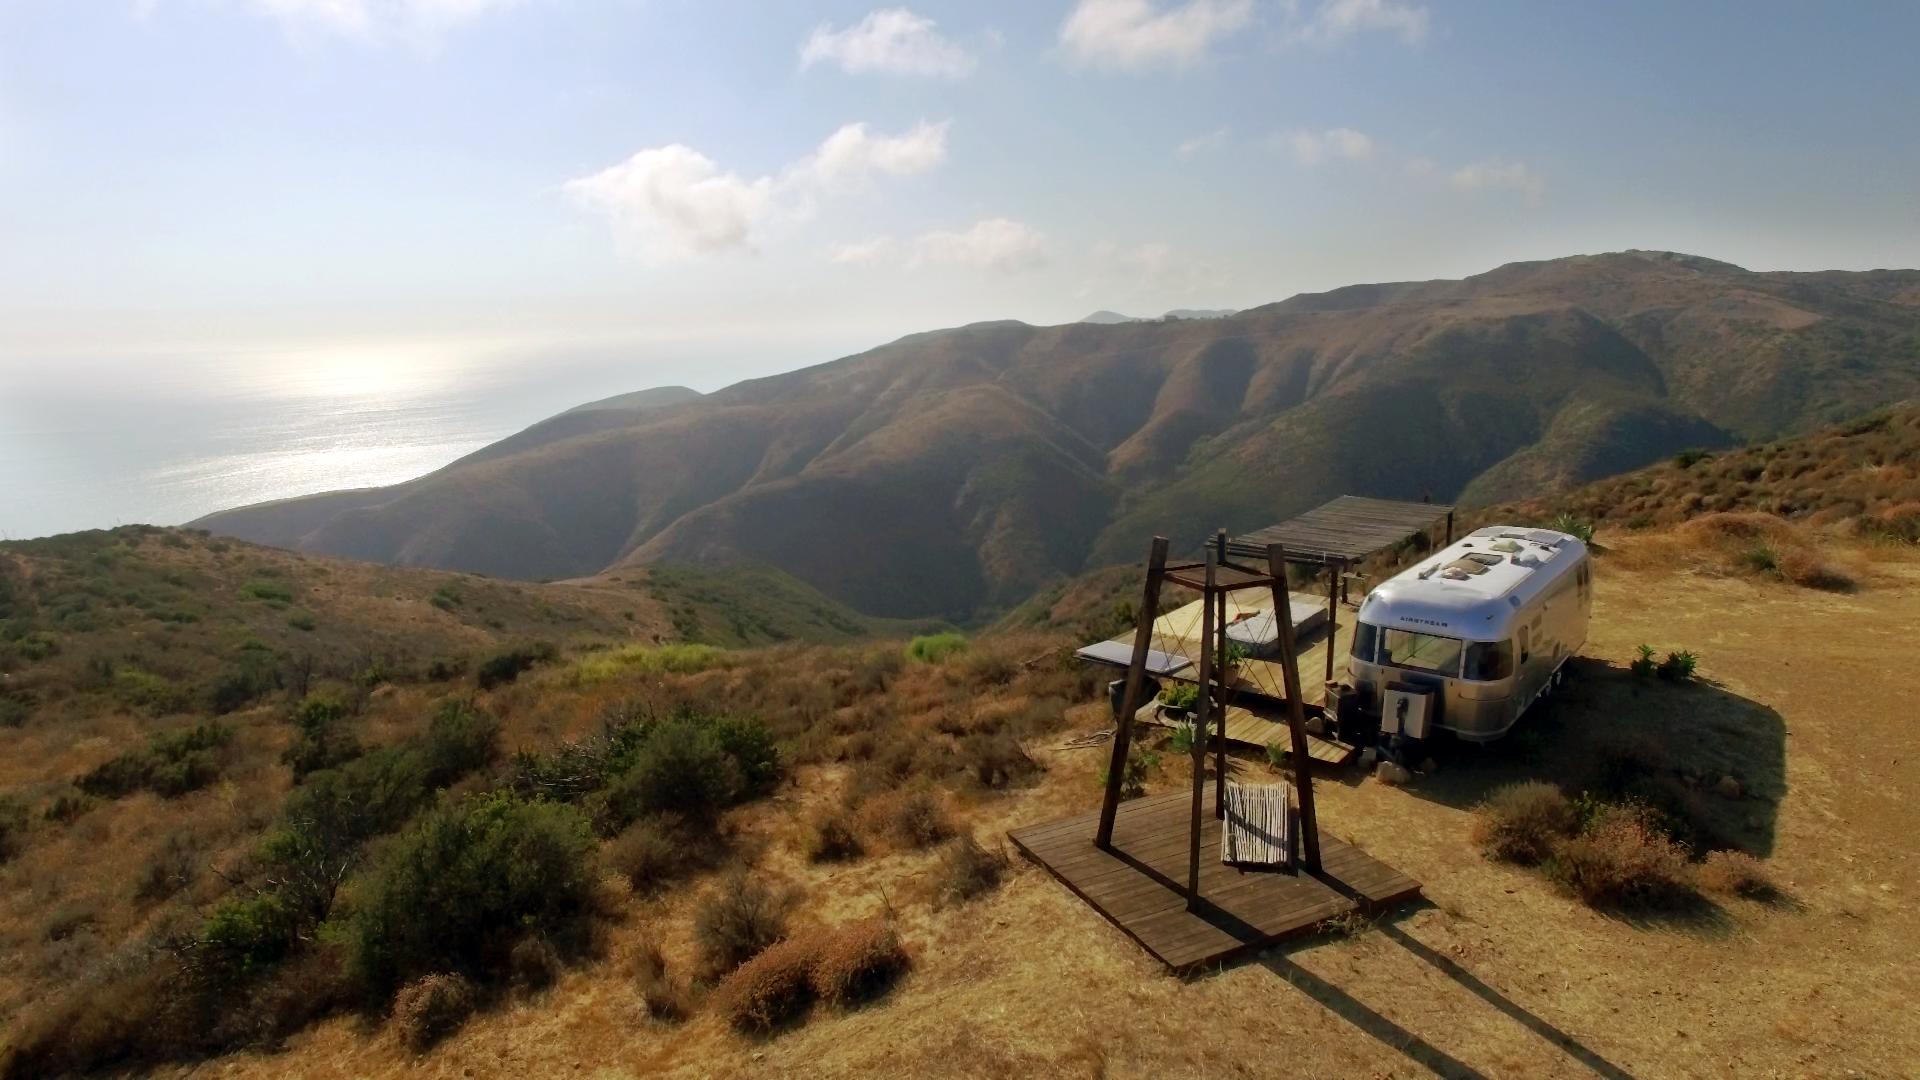 Malibu Airstream Spotlight